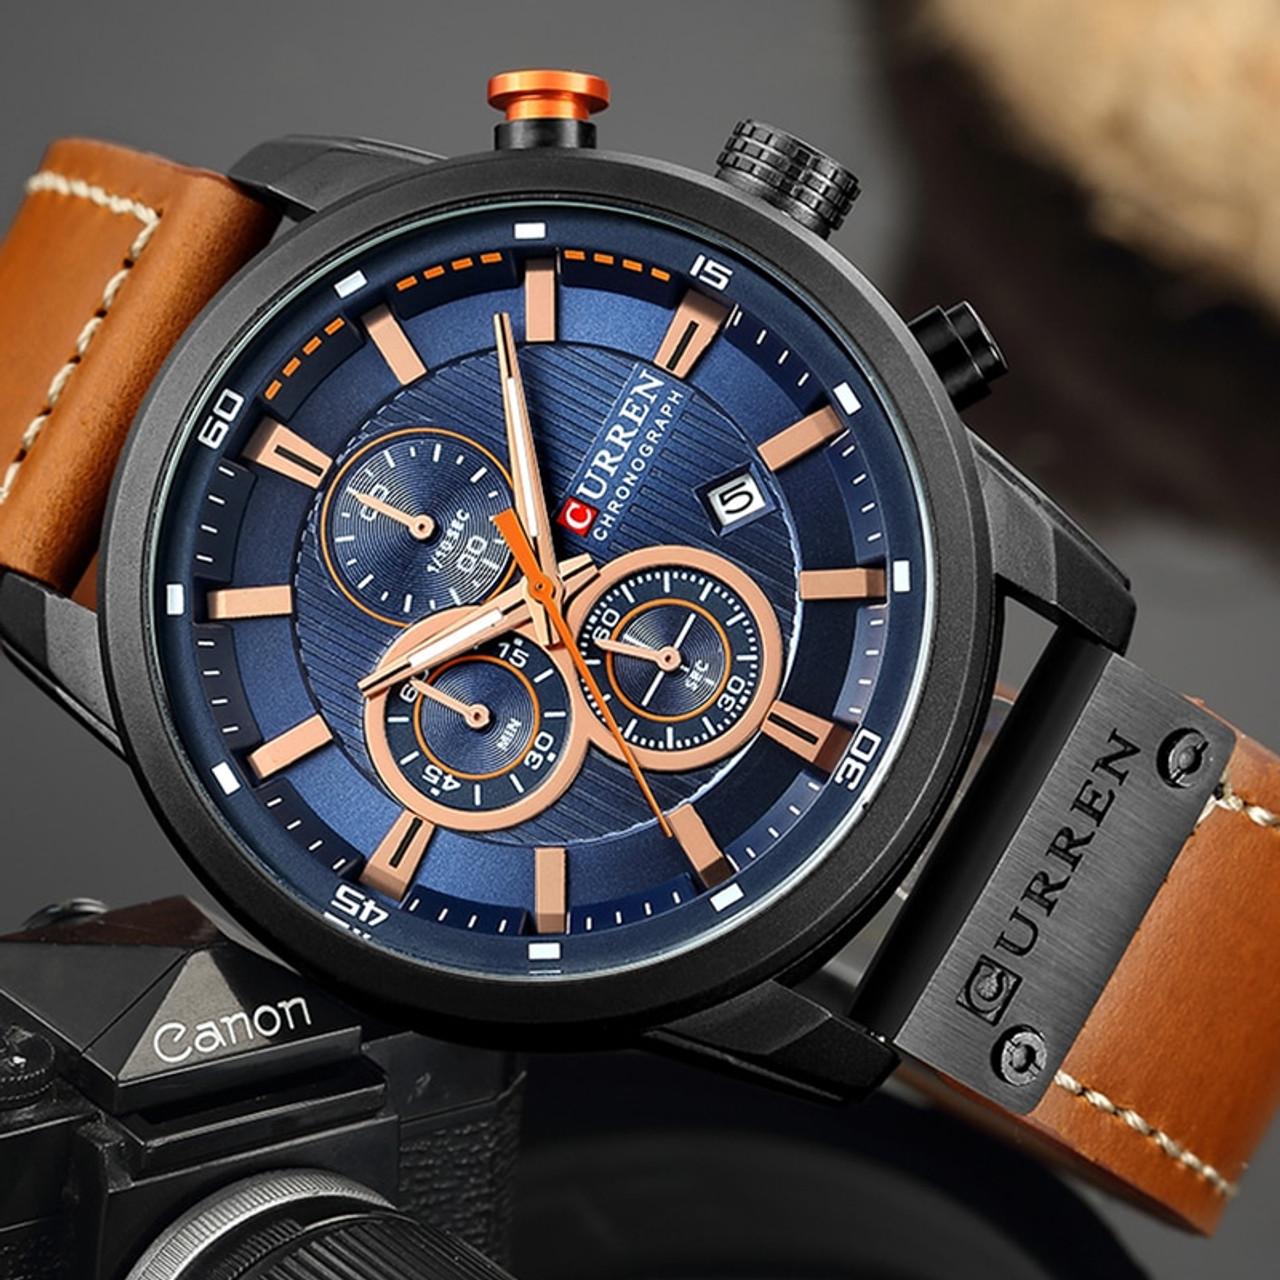 c13a2696b51 Relogio Masculino Curren 8291 Quartz Blue Vogue Business Sports Watches  Luxury Brand Men s Army Military Watch ...